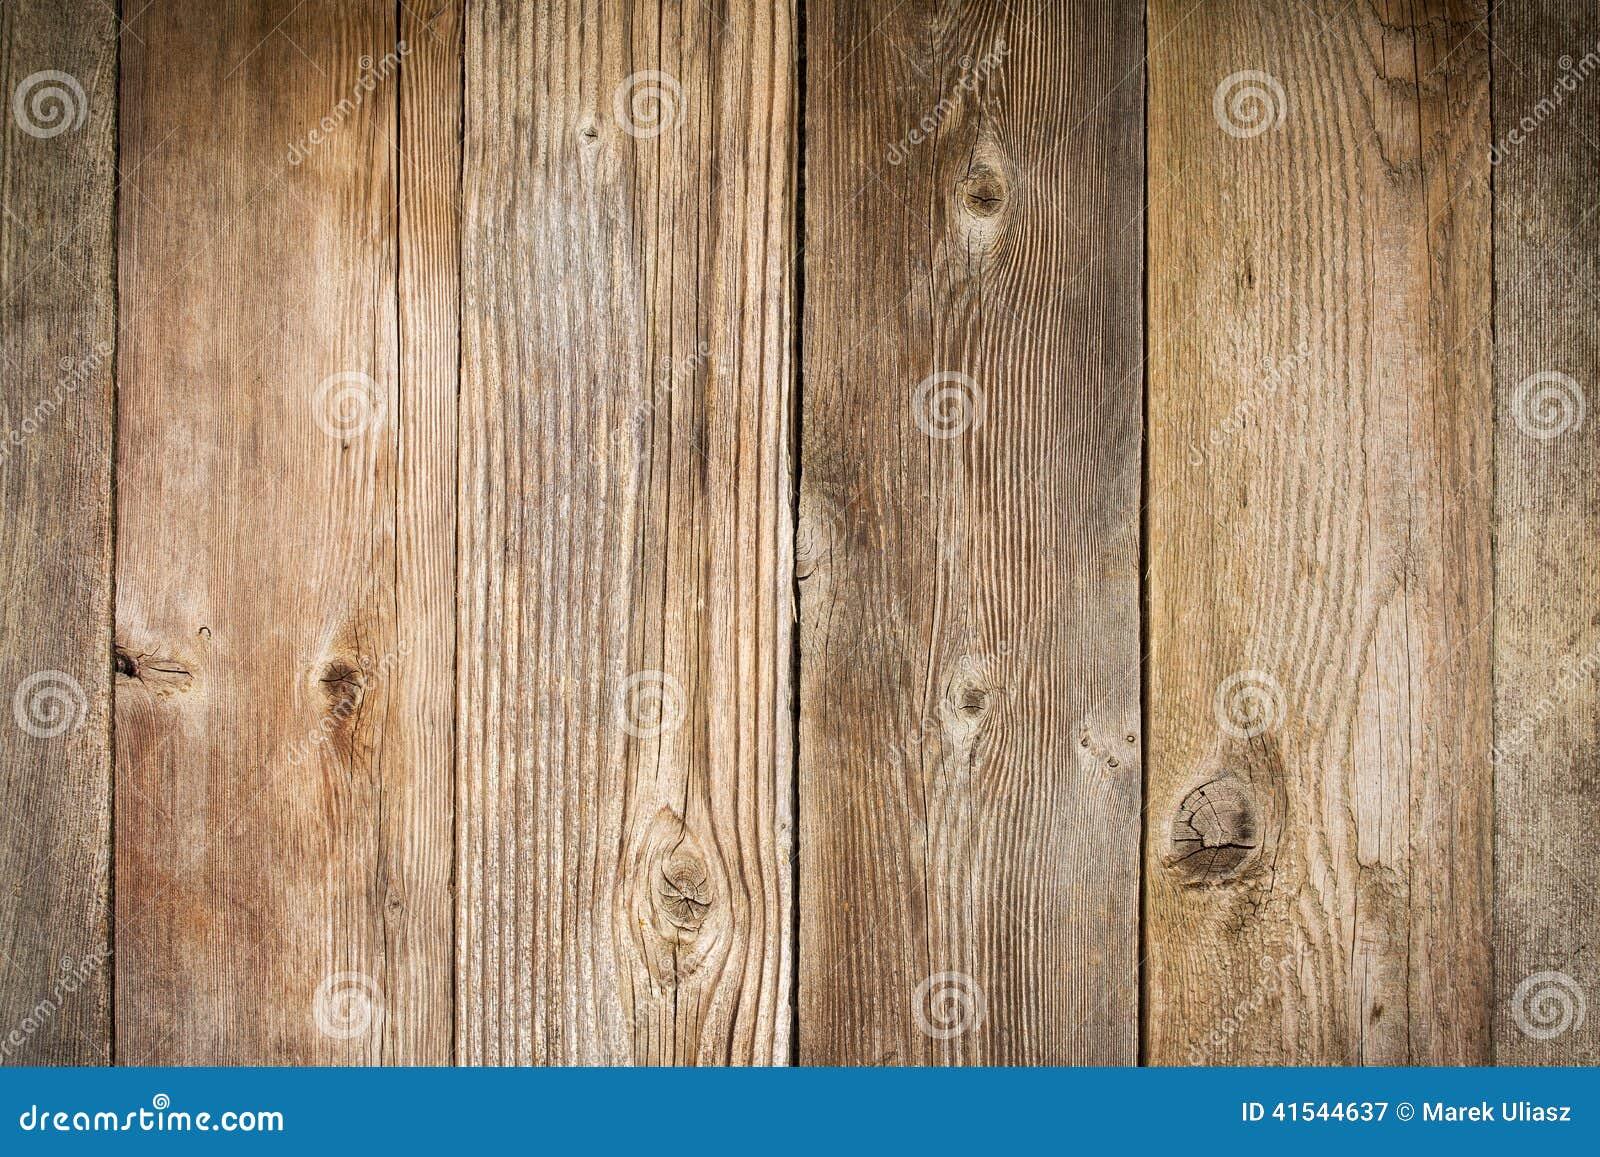 rustic weathered wood background stock photo image 41544637